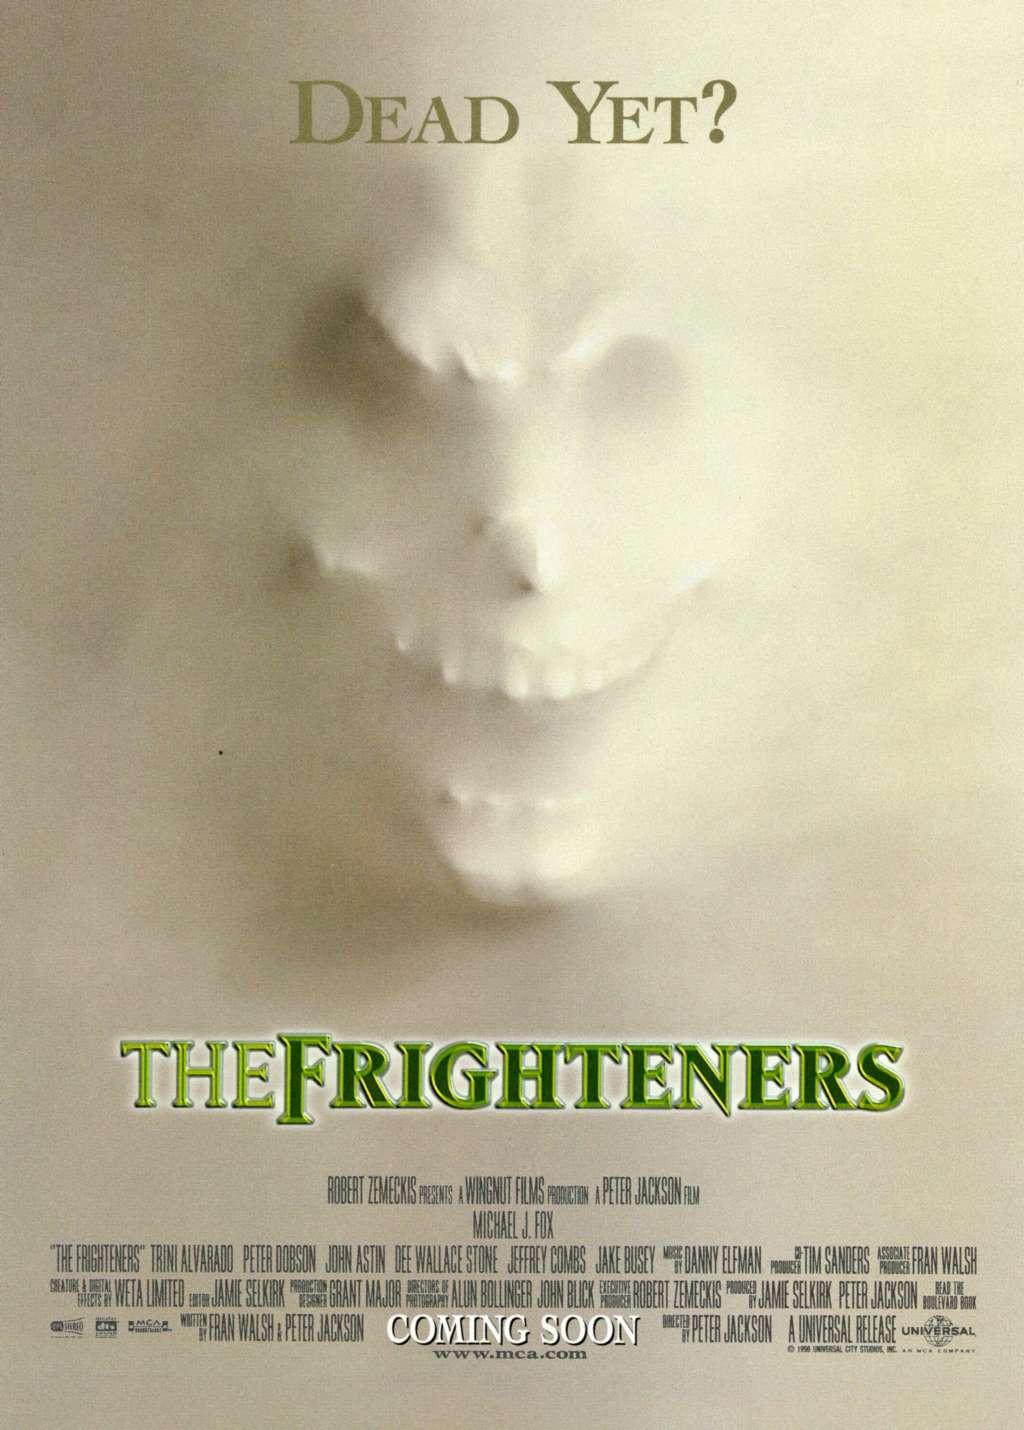 The Frighteners kapak